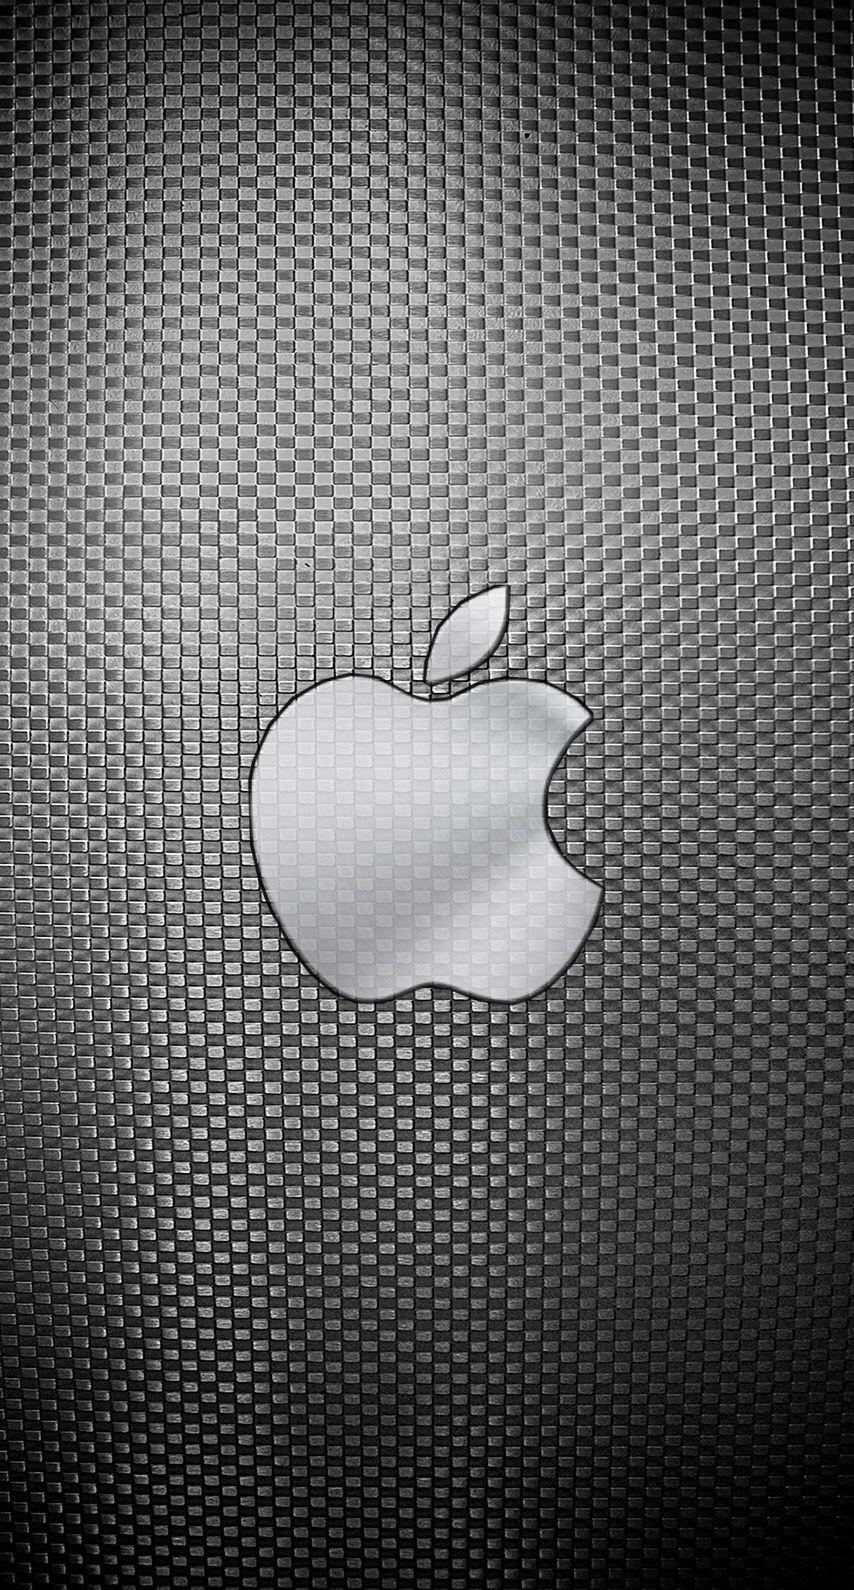 Pin By Cindy Jones On Apple Iphone Apple Wallpaper Apple Wallpaper Iphone Apple Logo Wallpaper